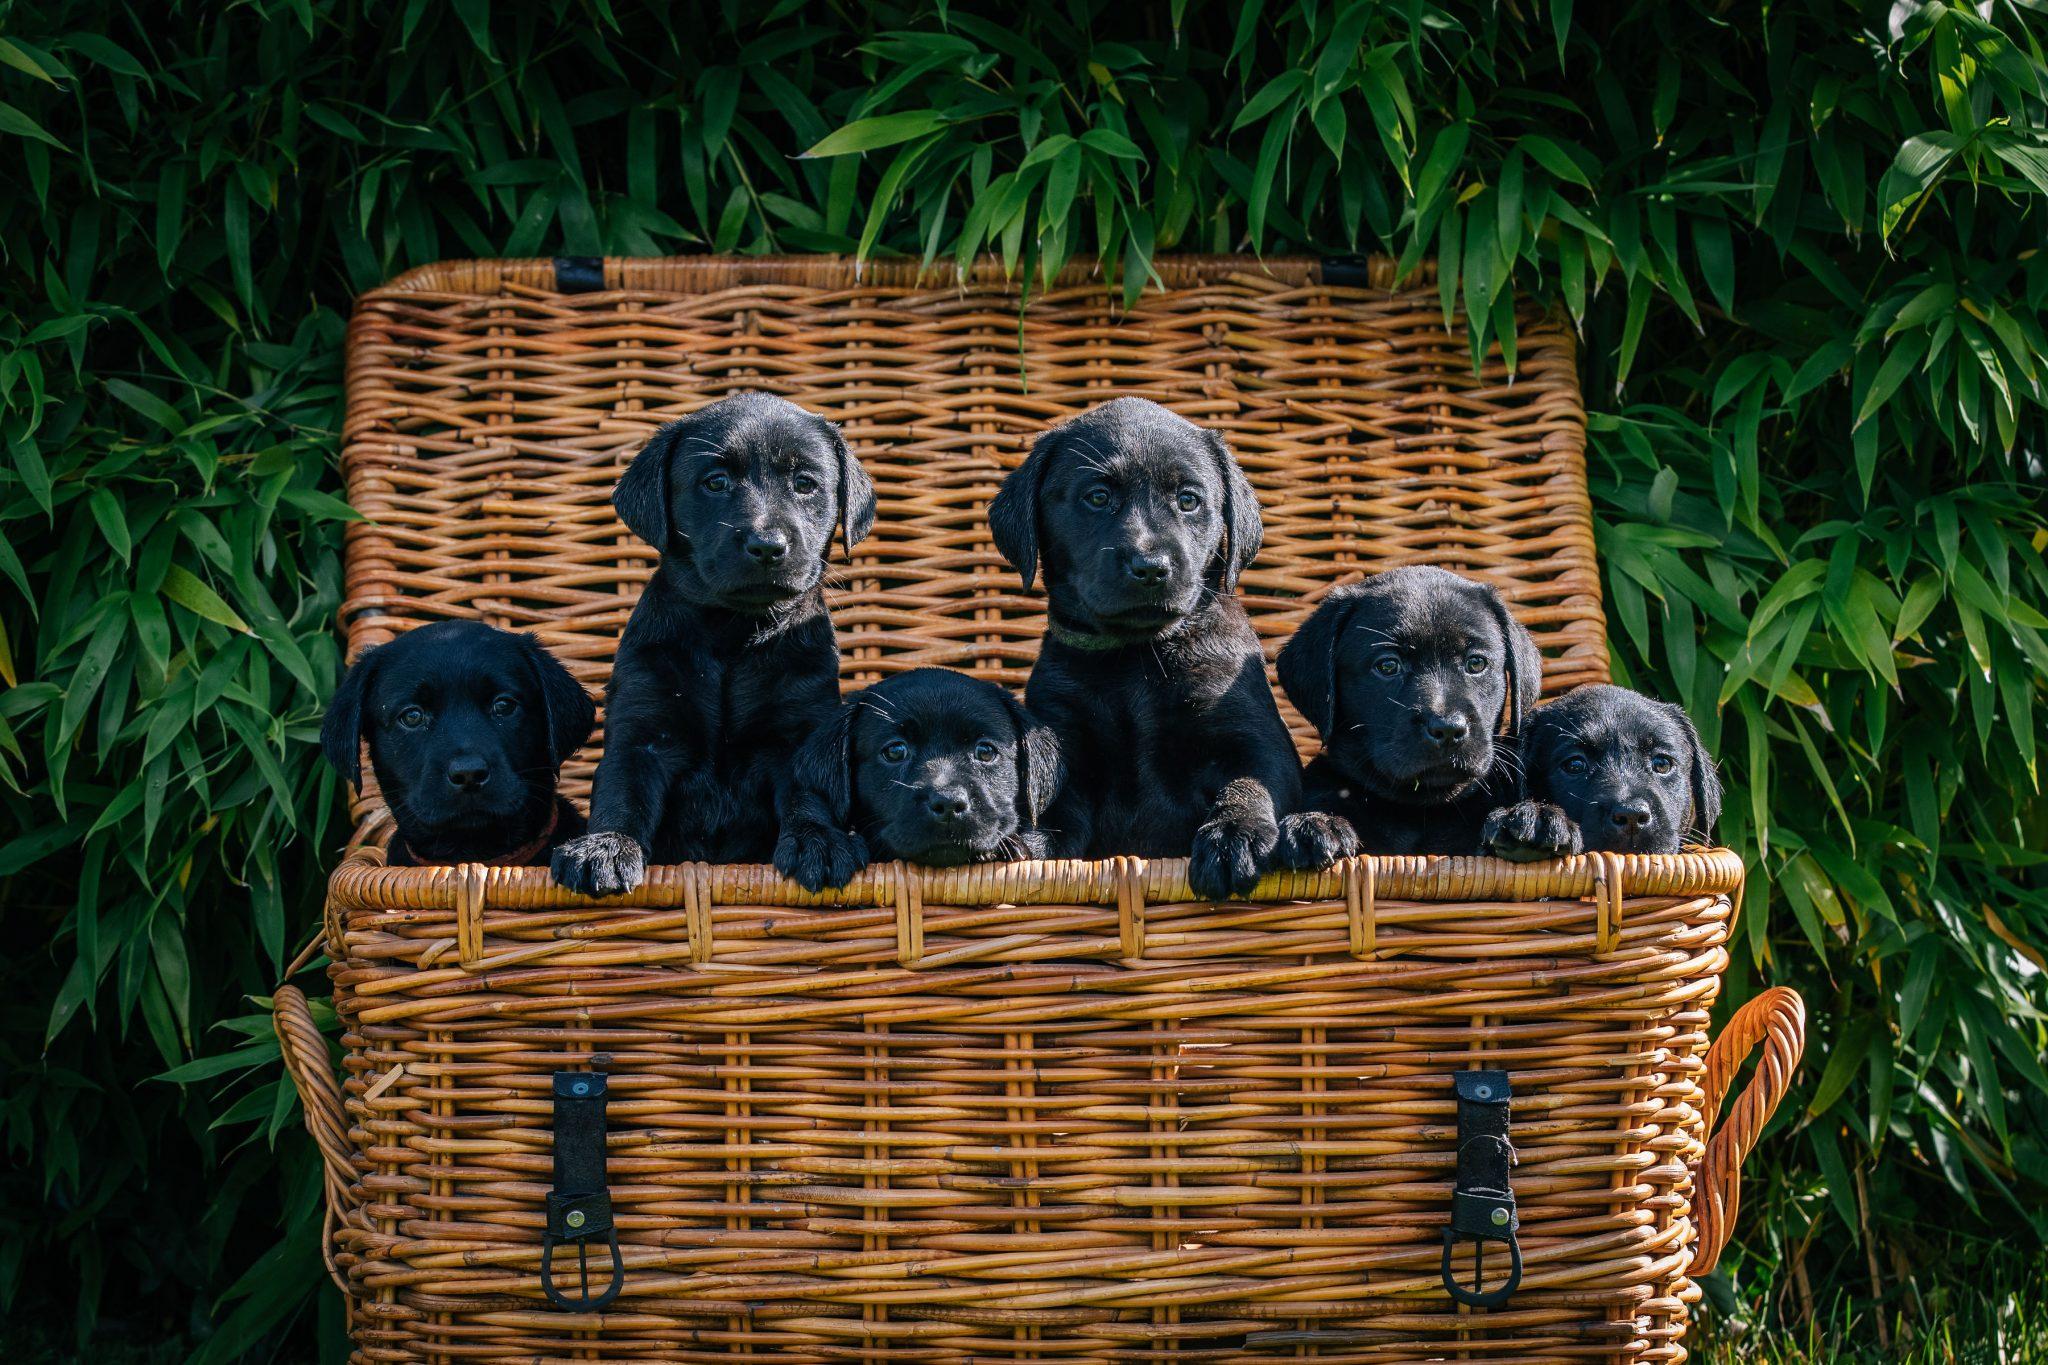 Black Labrador Puppies Pet portrait photoshoot Chesire Joanna Eardley Photography